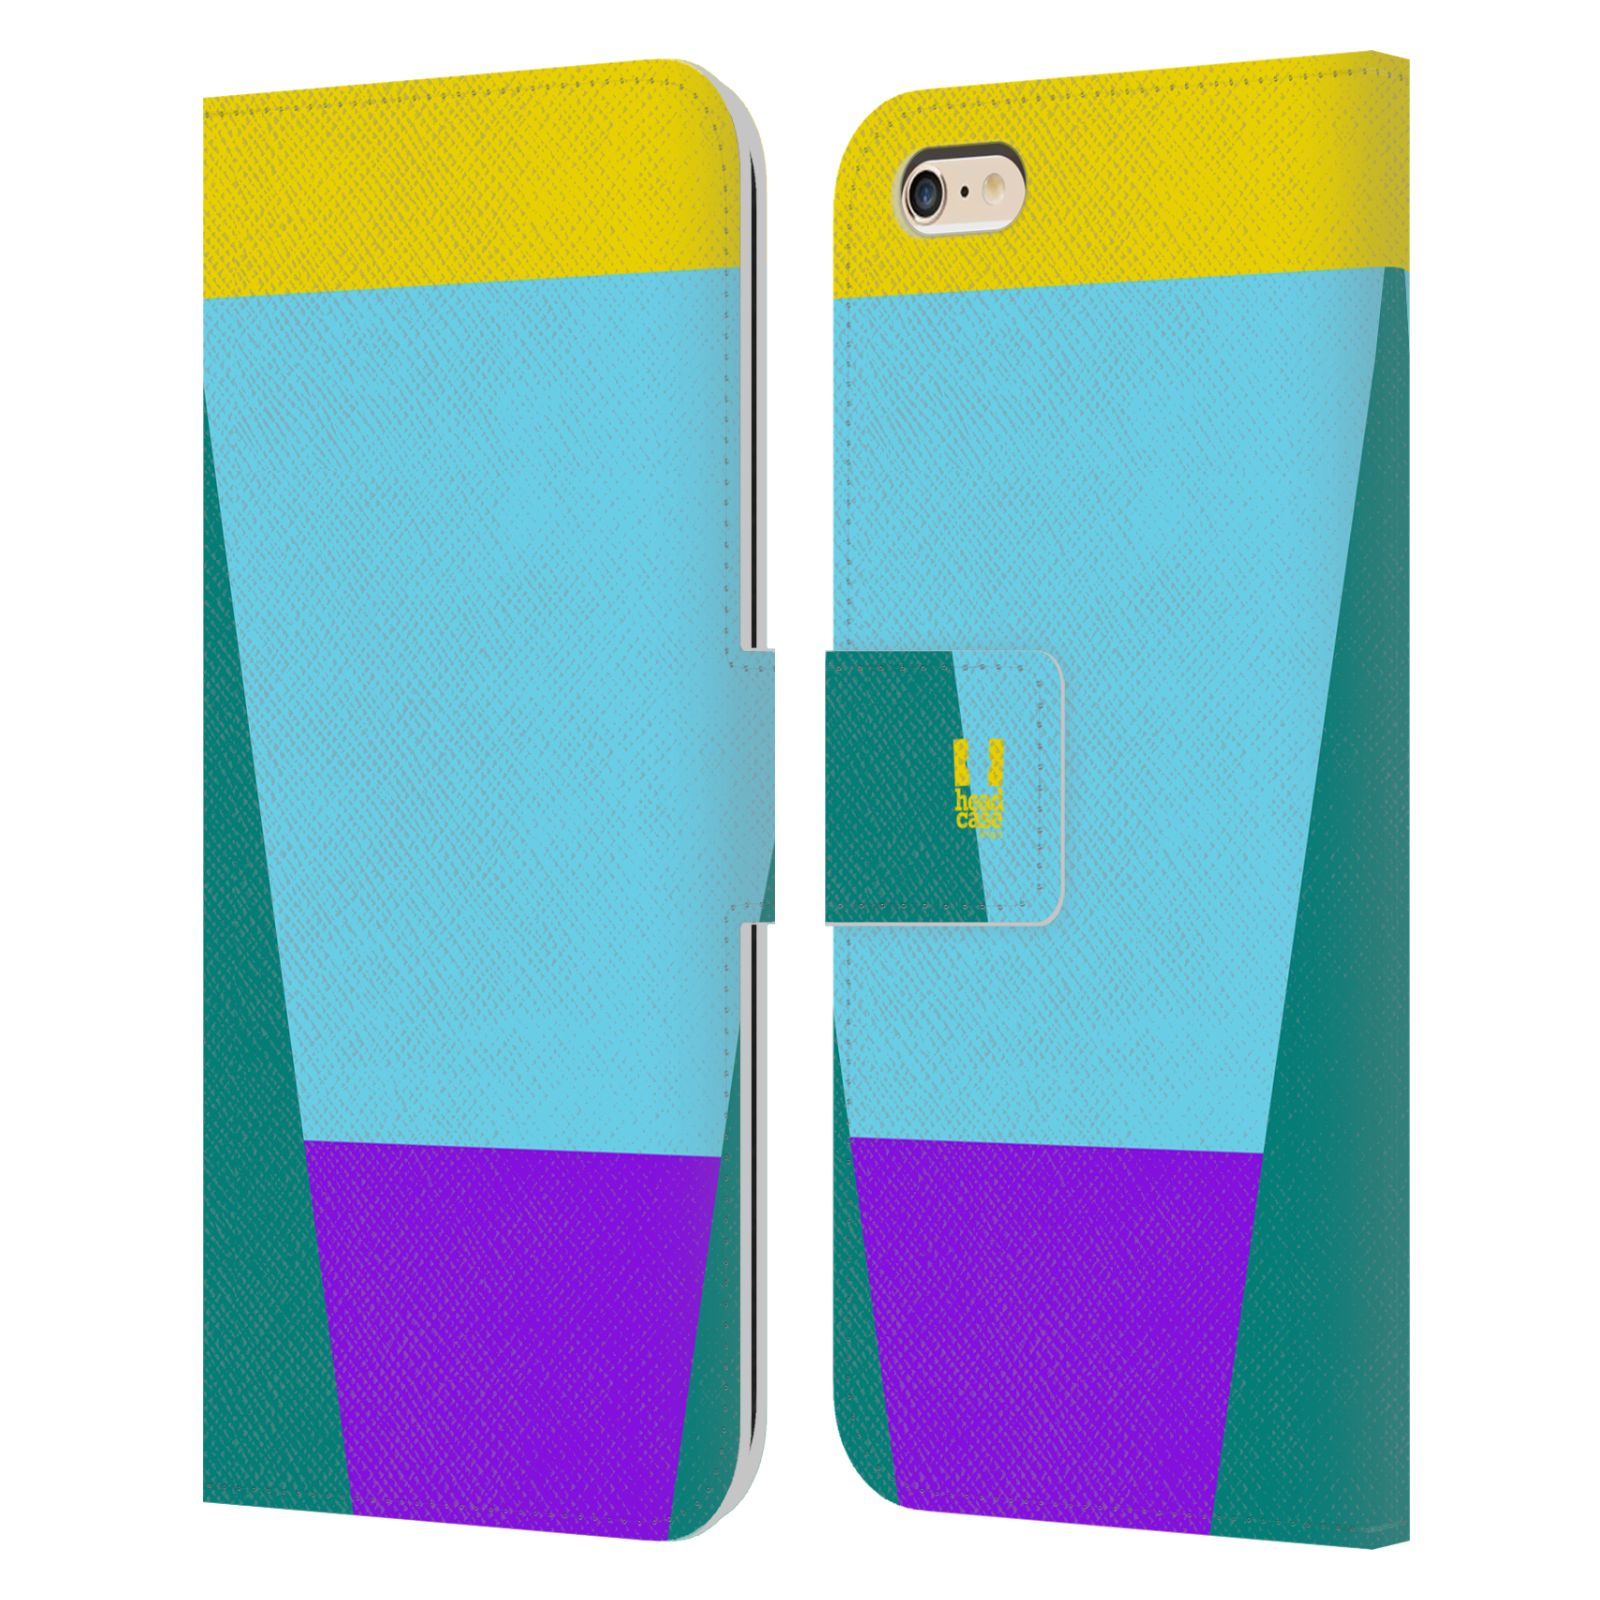 HEAD CASE Flipové pouzdro pro mobil Apple Iphone 6 PLUS/6S PLUS barevné tvary nebesky modrá